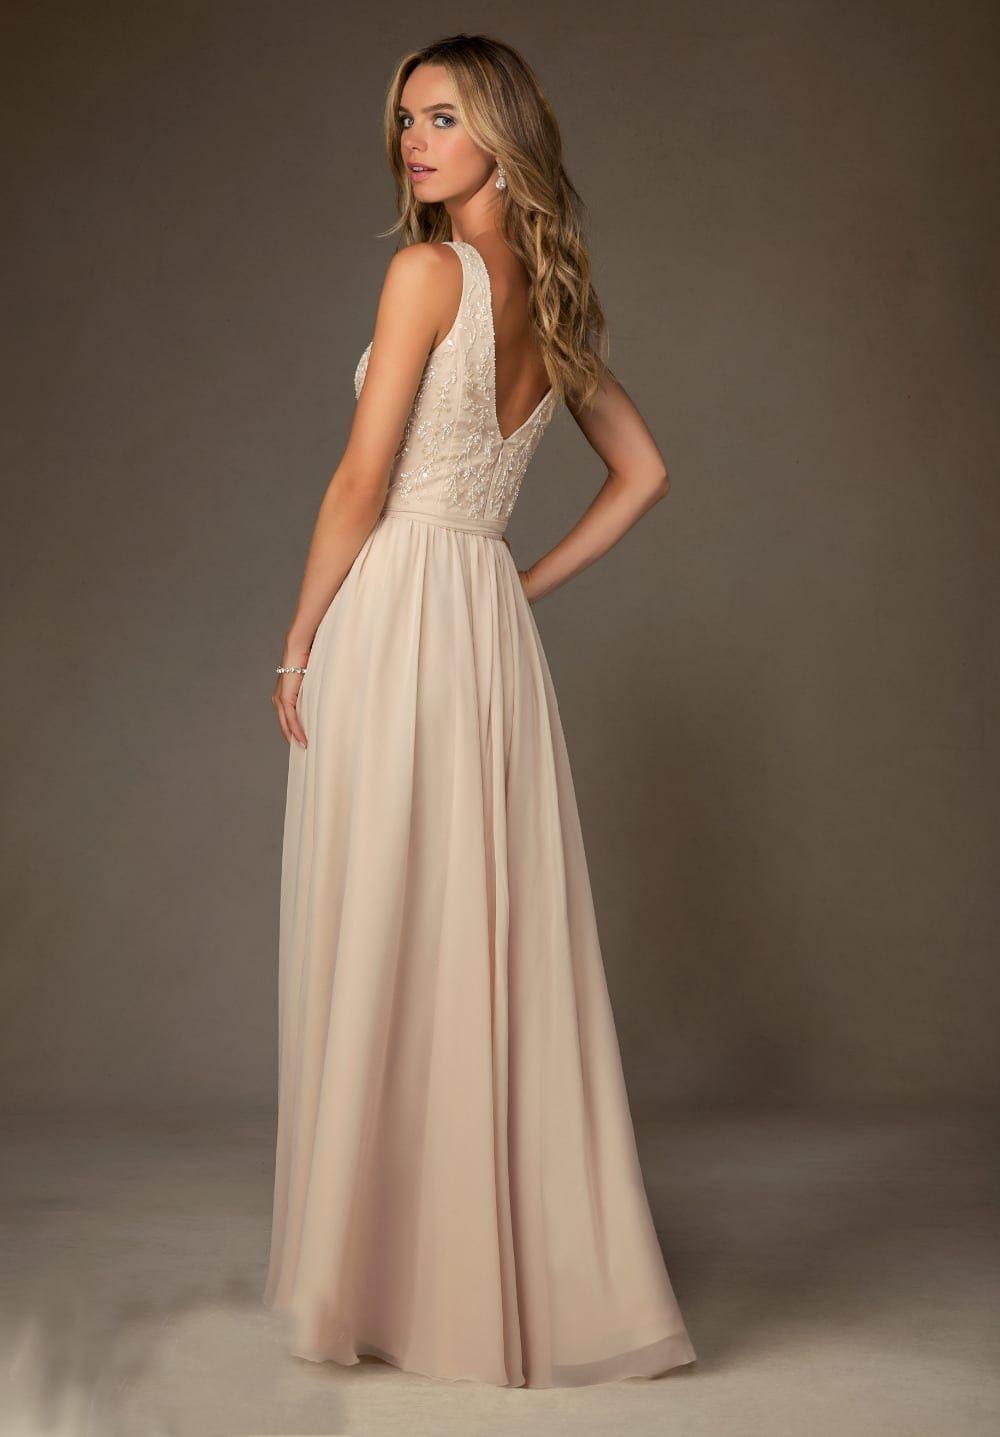 2020 Silver Sparkly Prom Dress Long V Neck Beaded A Line